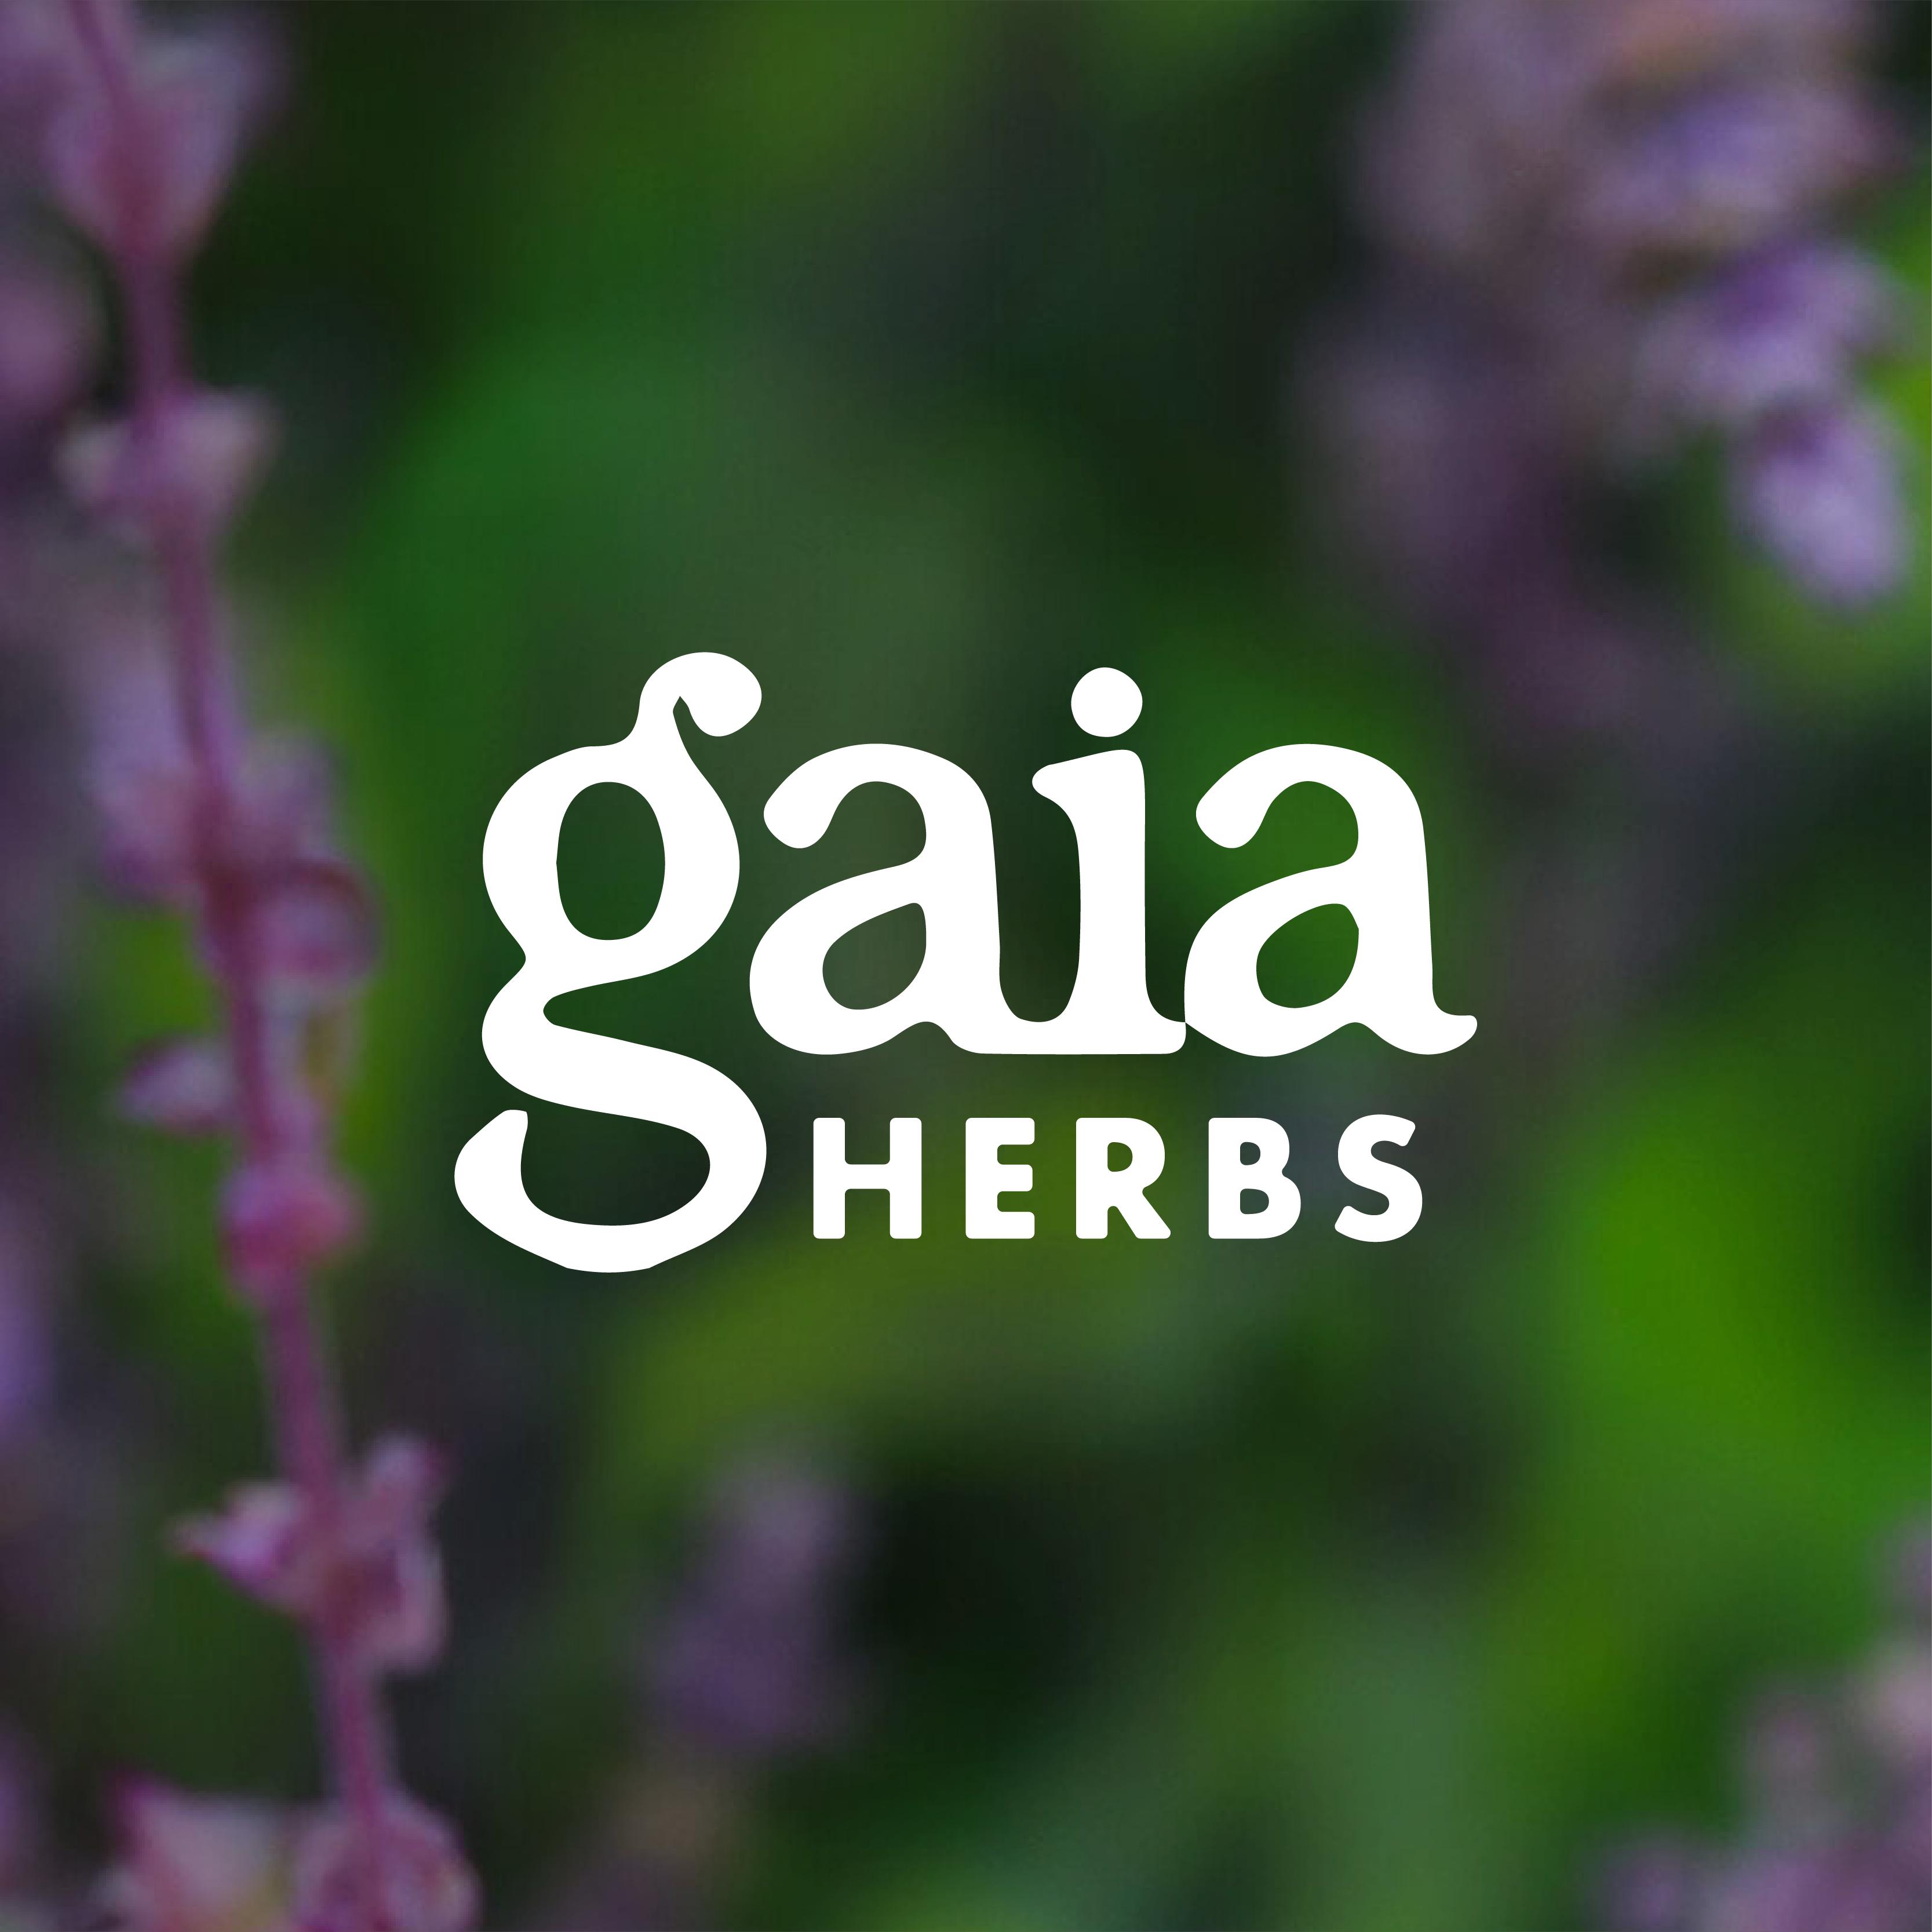 Website_GaiaHerbs